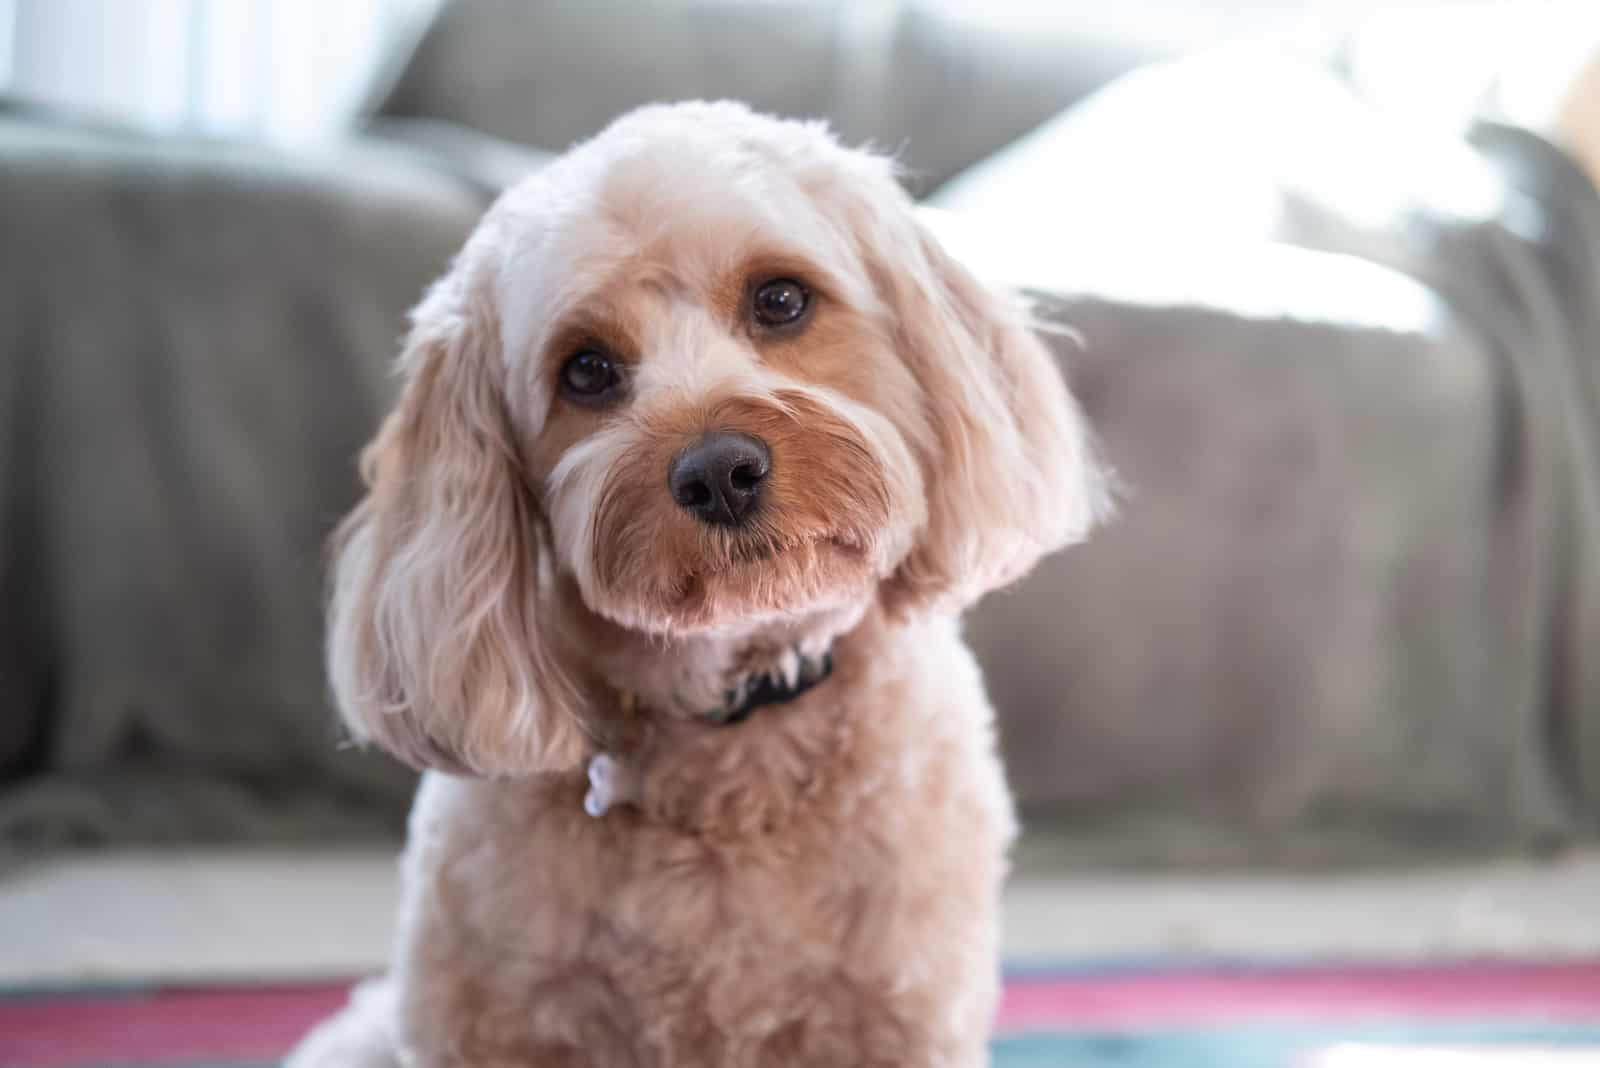 Sweet Cavapoo Puppy Dog